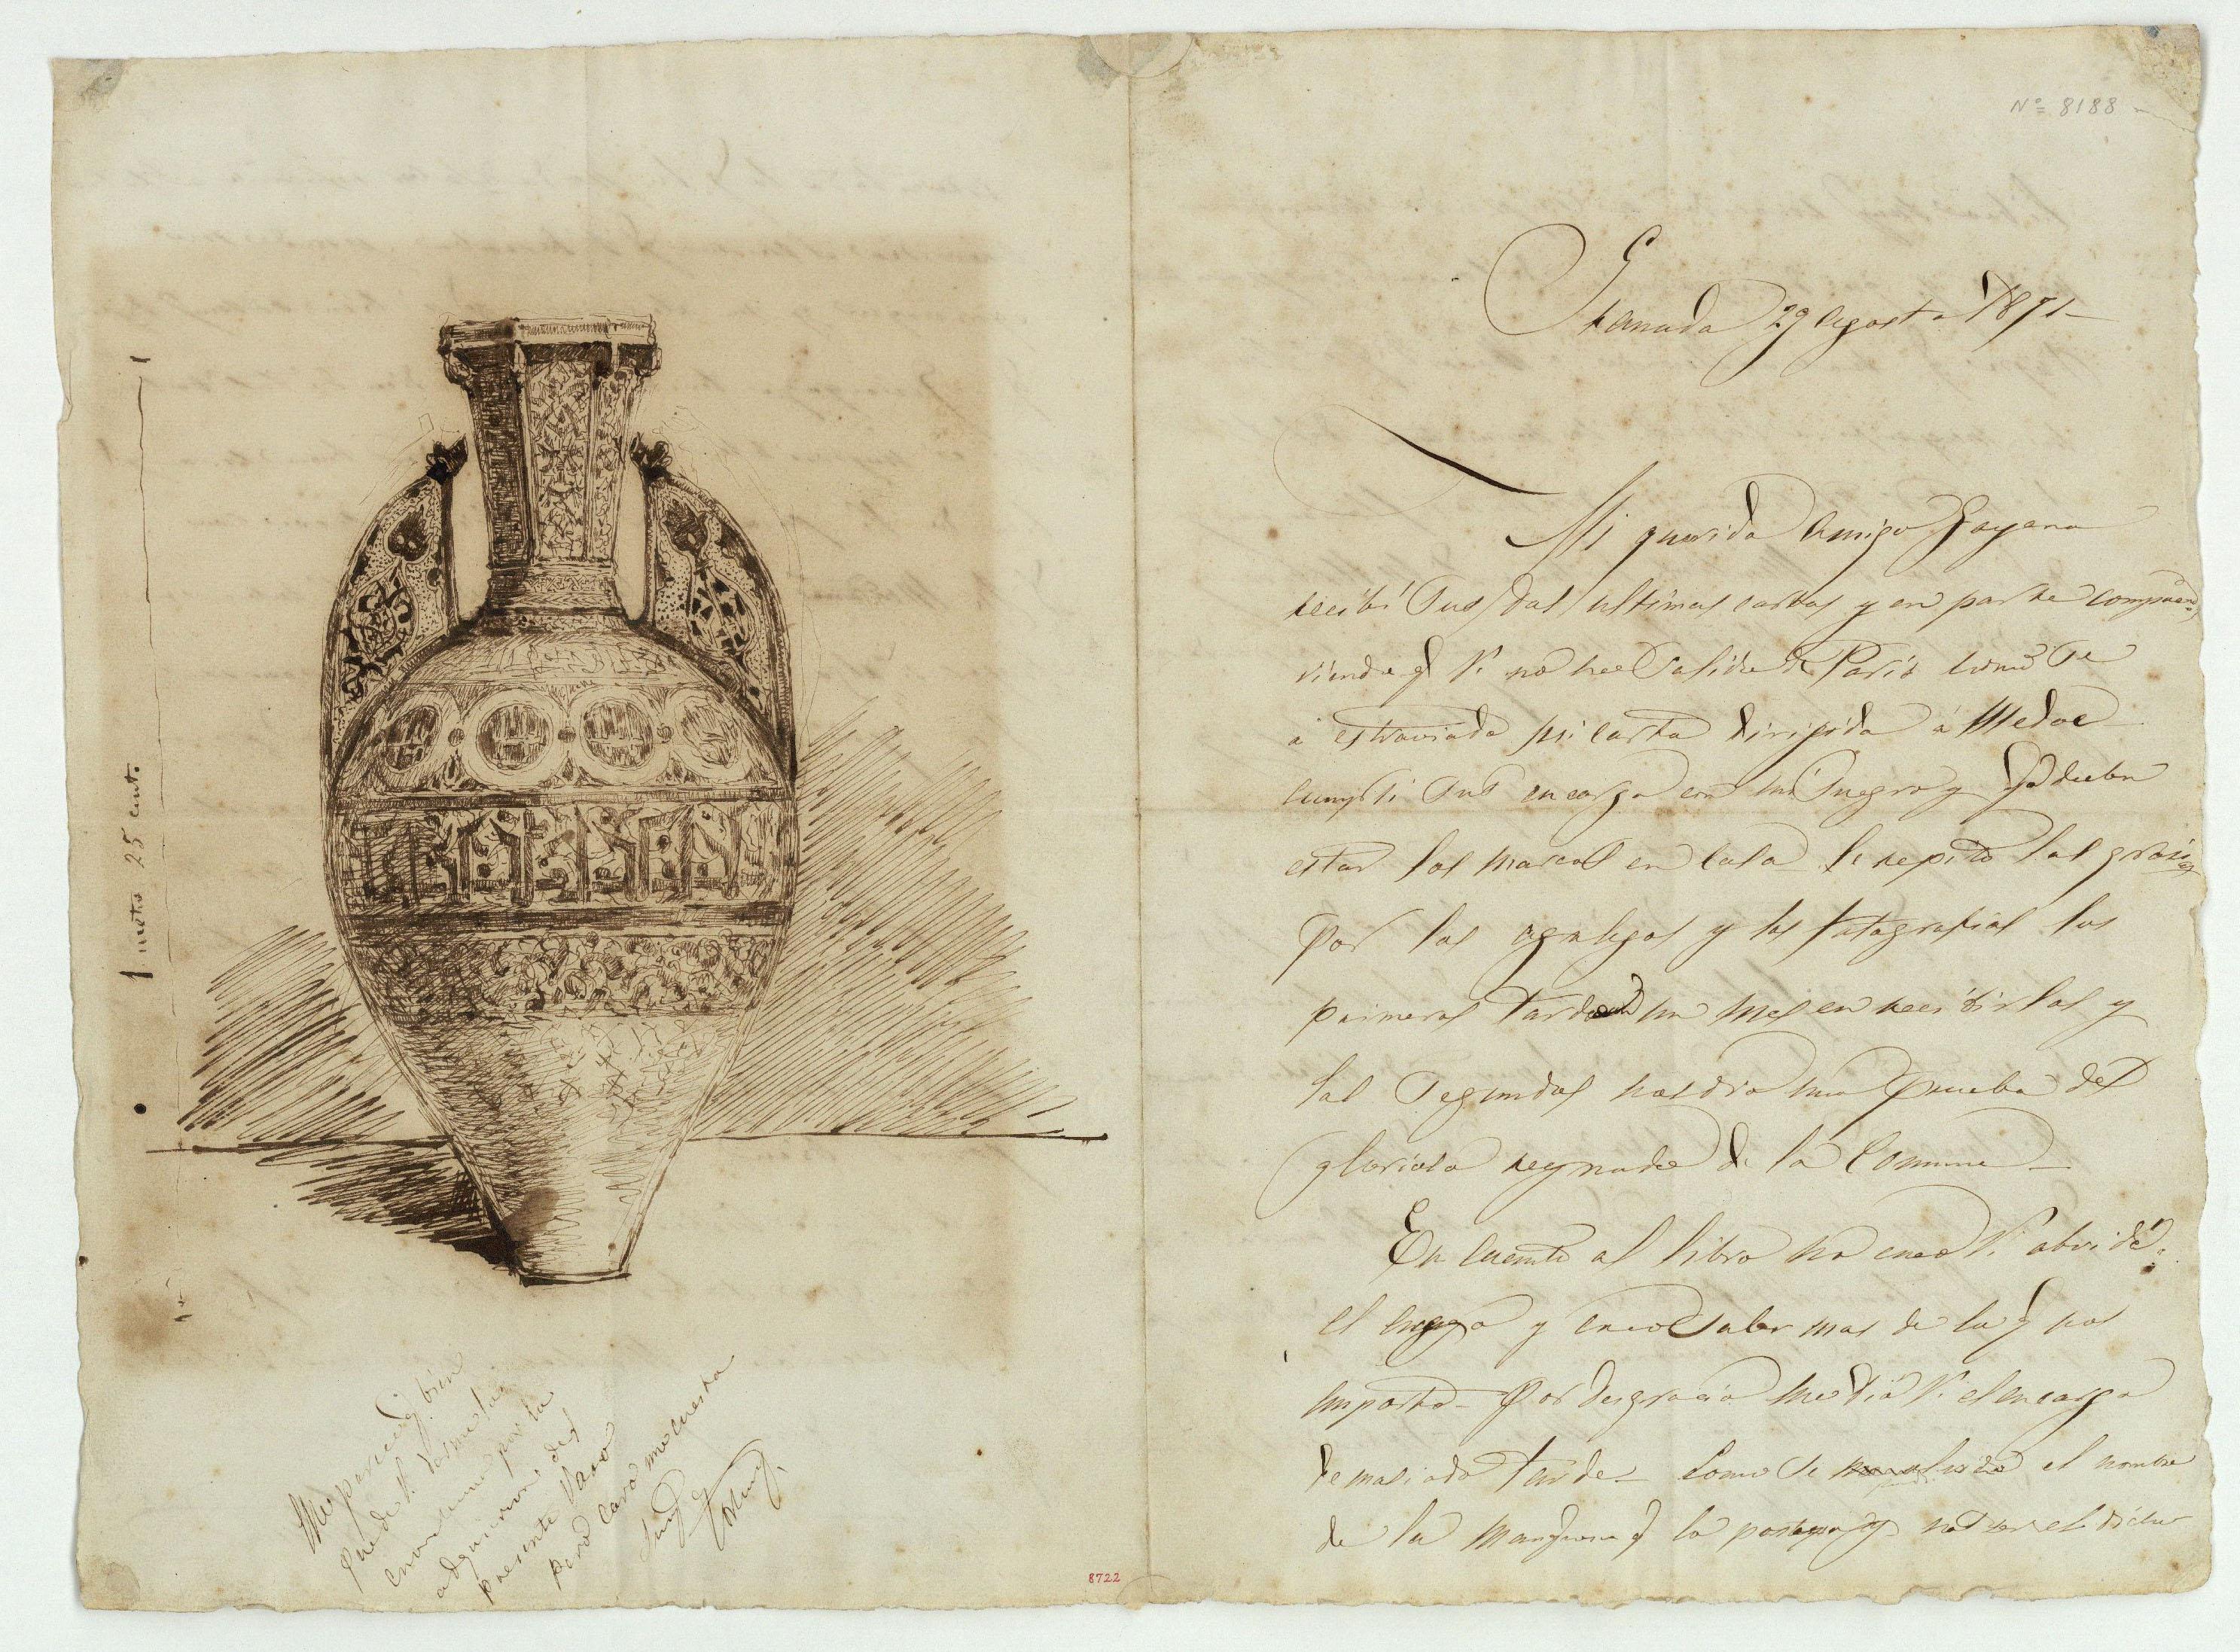 Marià Fortuny - Muslim-style vase - 1871